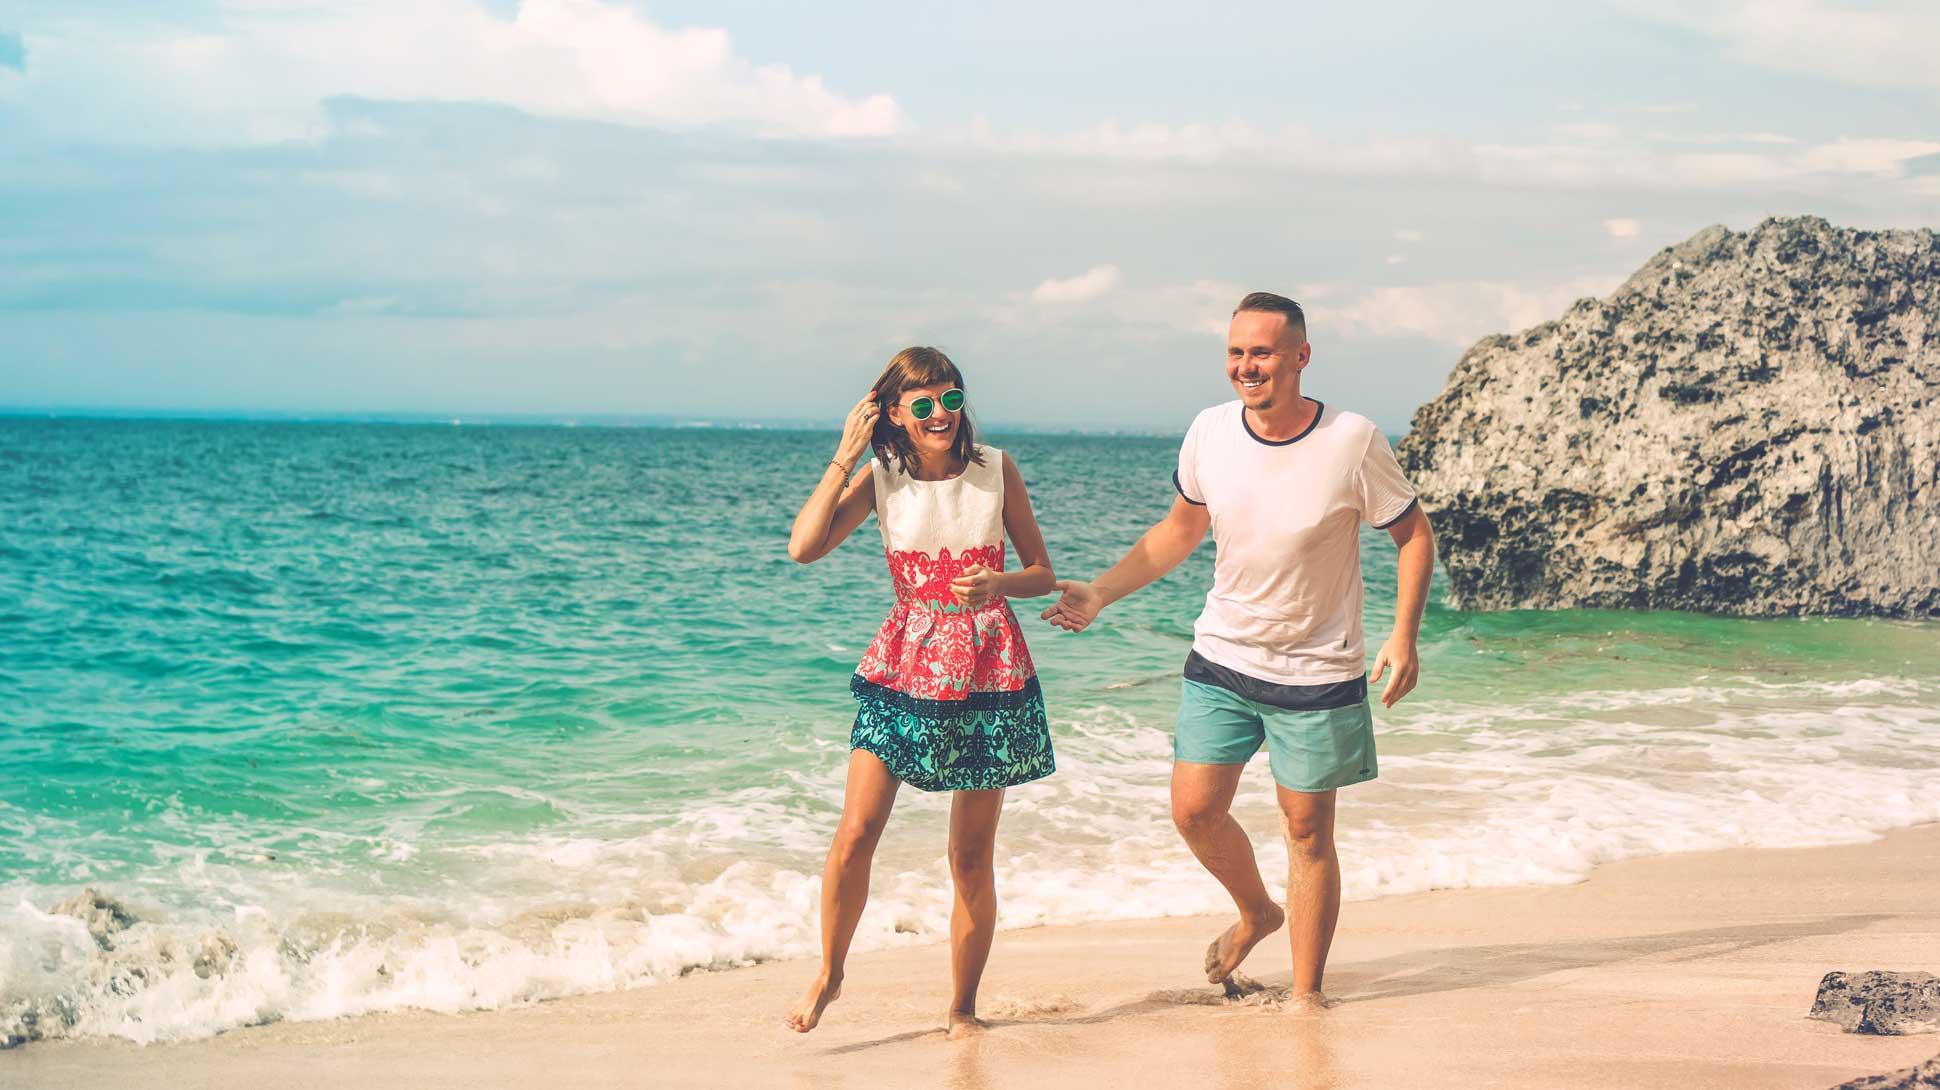 Ошибки в заявлении на отпуск